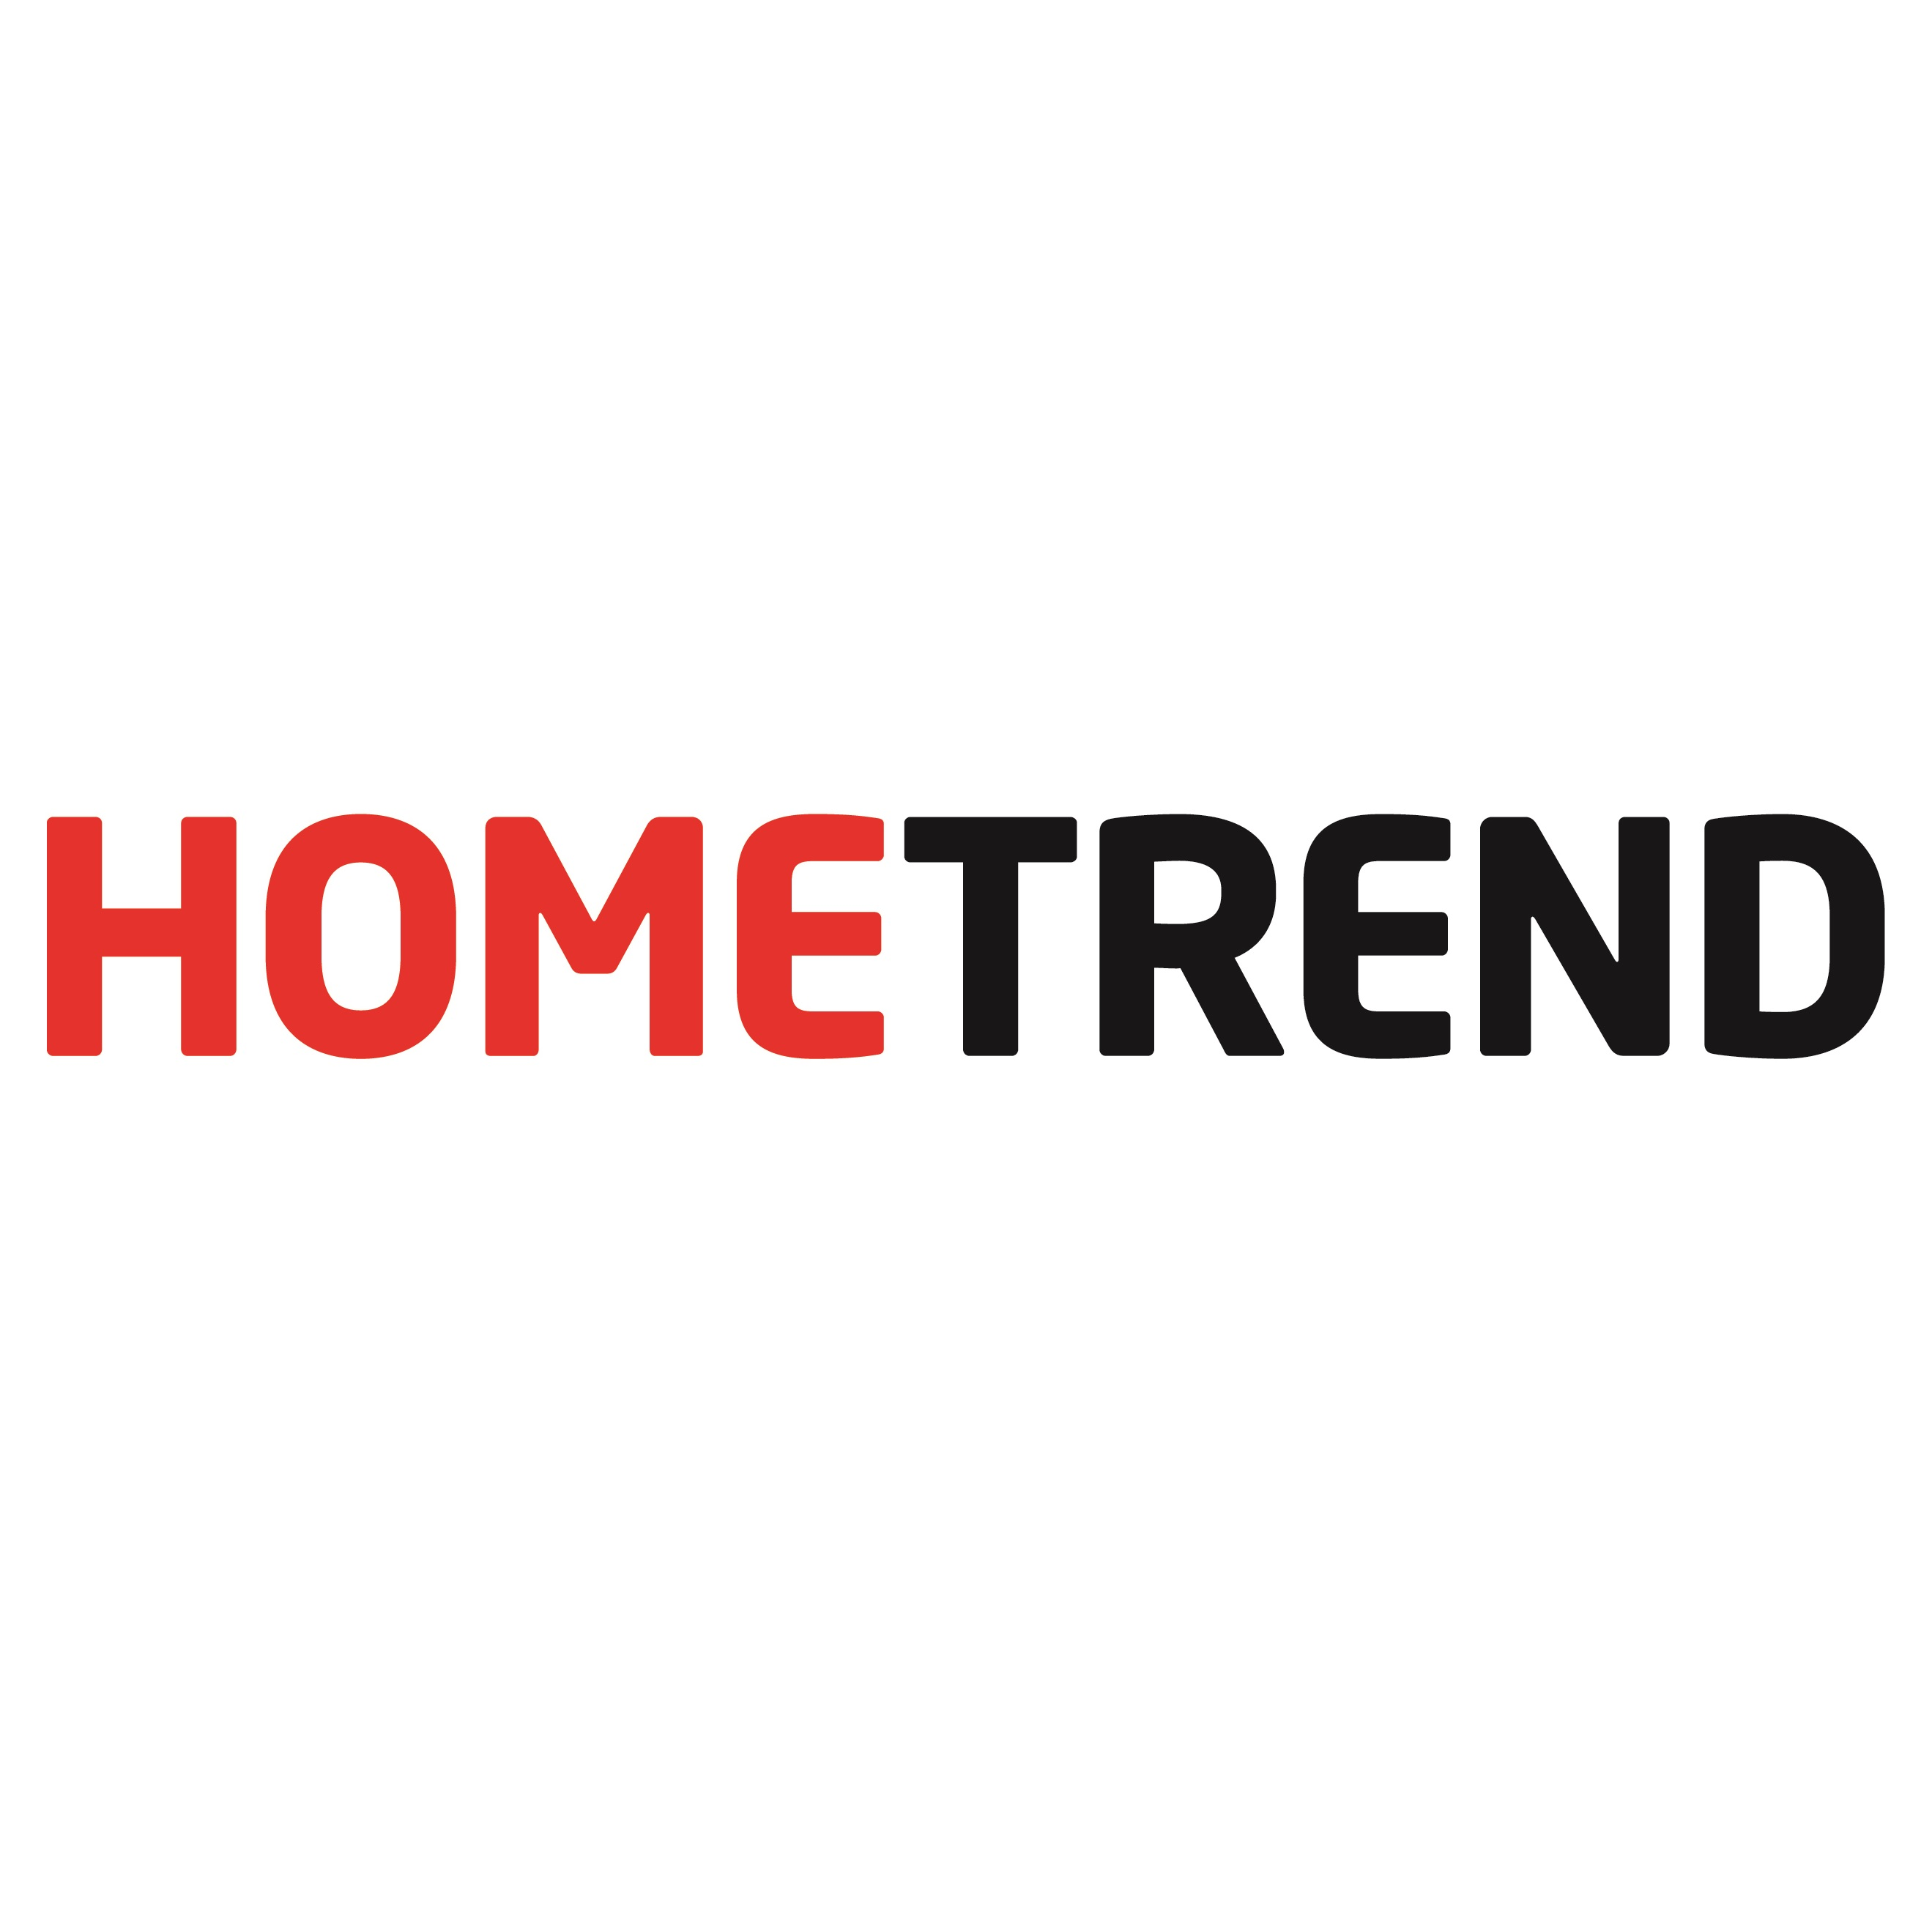 schlau hometrend handwerkermarkt saarbr cken in. Black Bedroom Furniture Sets. Home Design Ideas